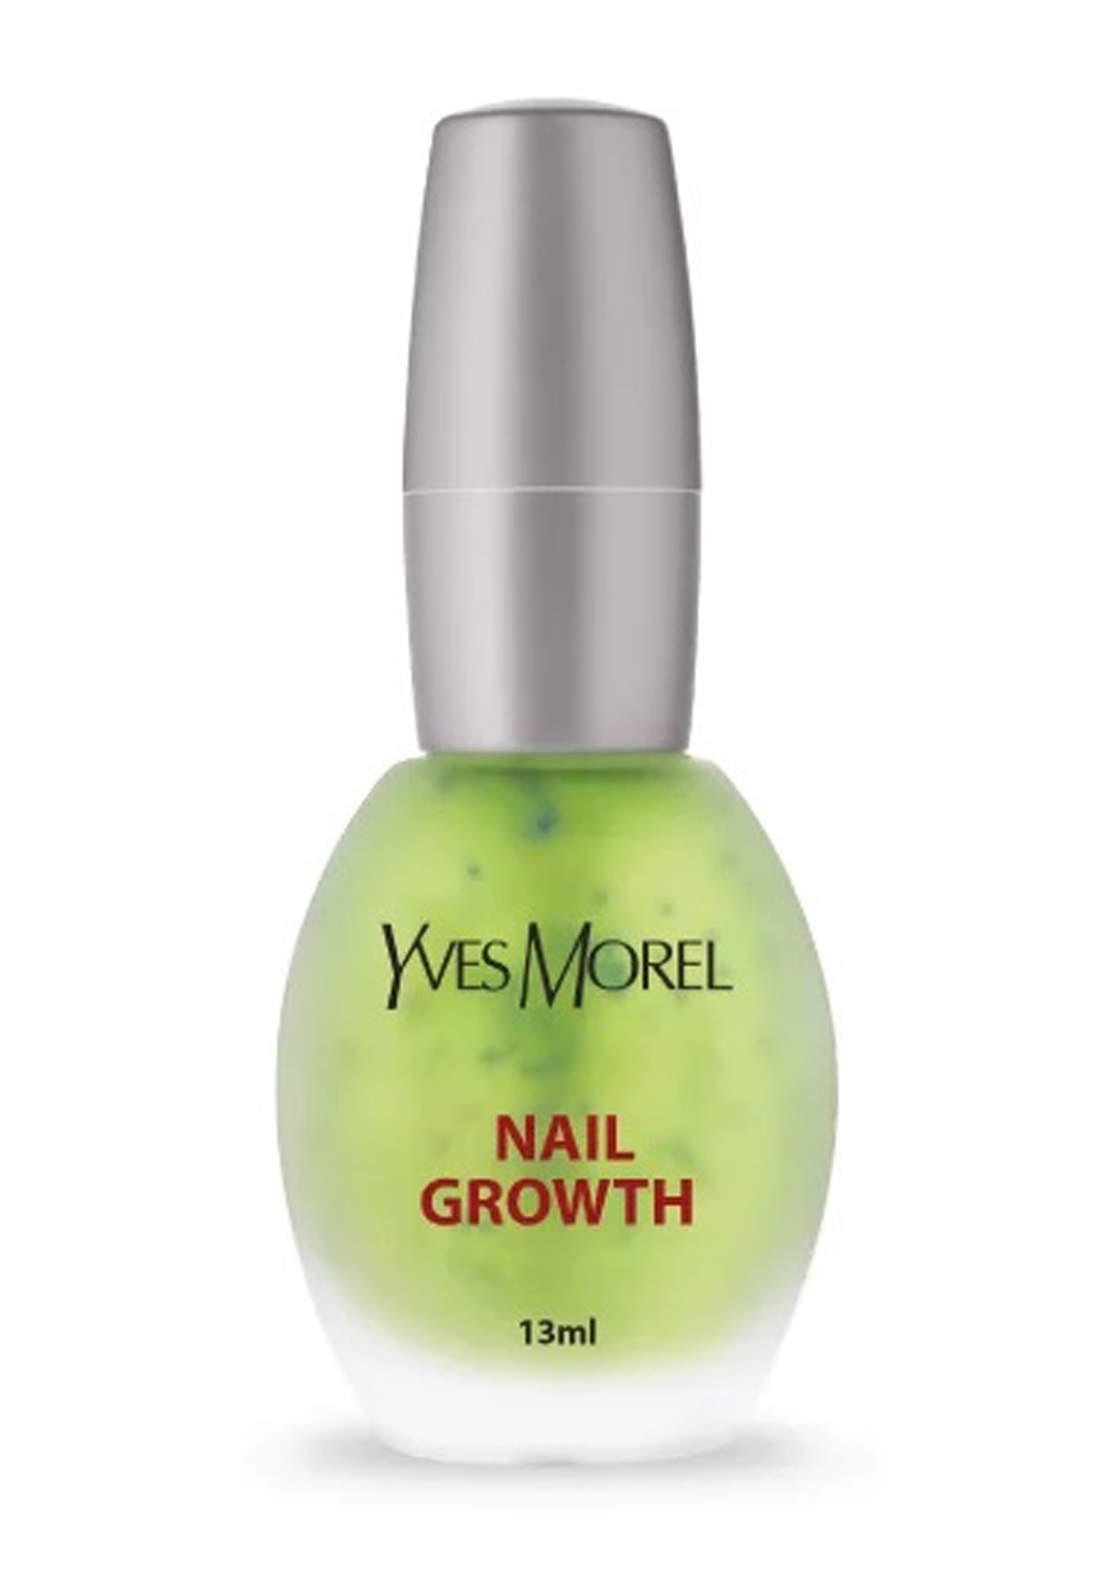 Yves Morel  Nail Growth 13ml مطول ومقوي للاظافر